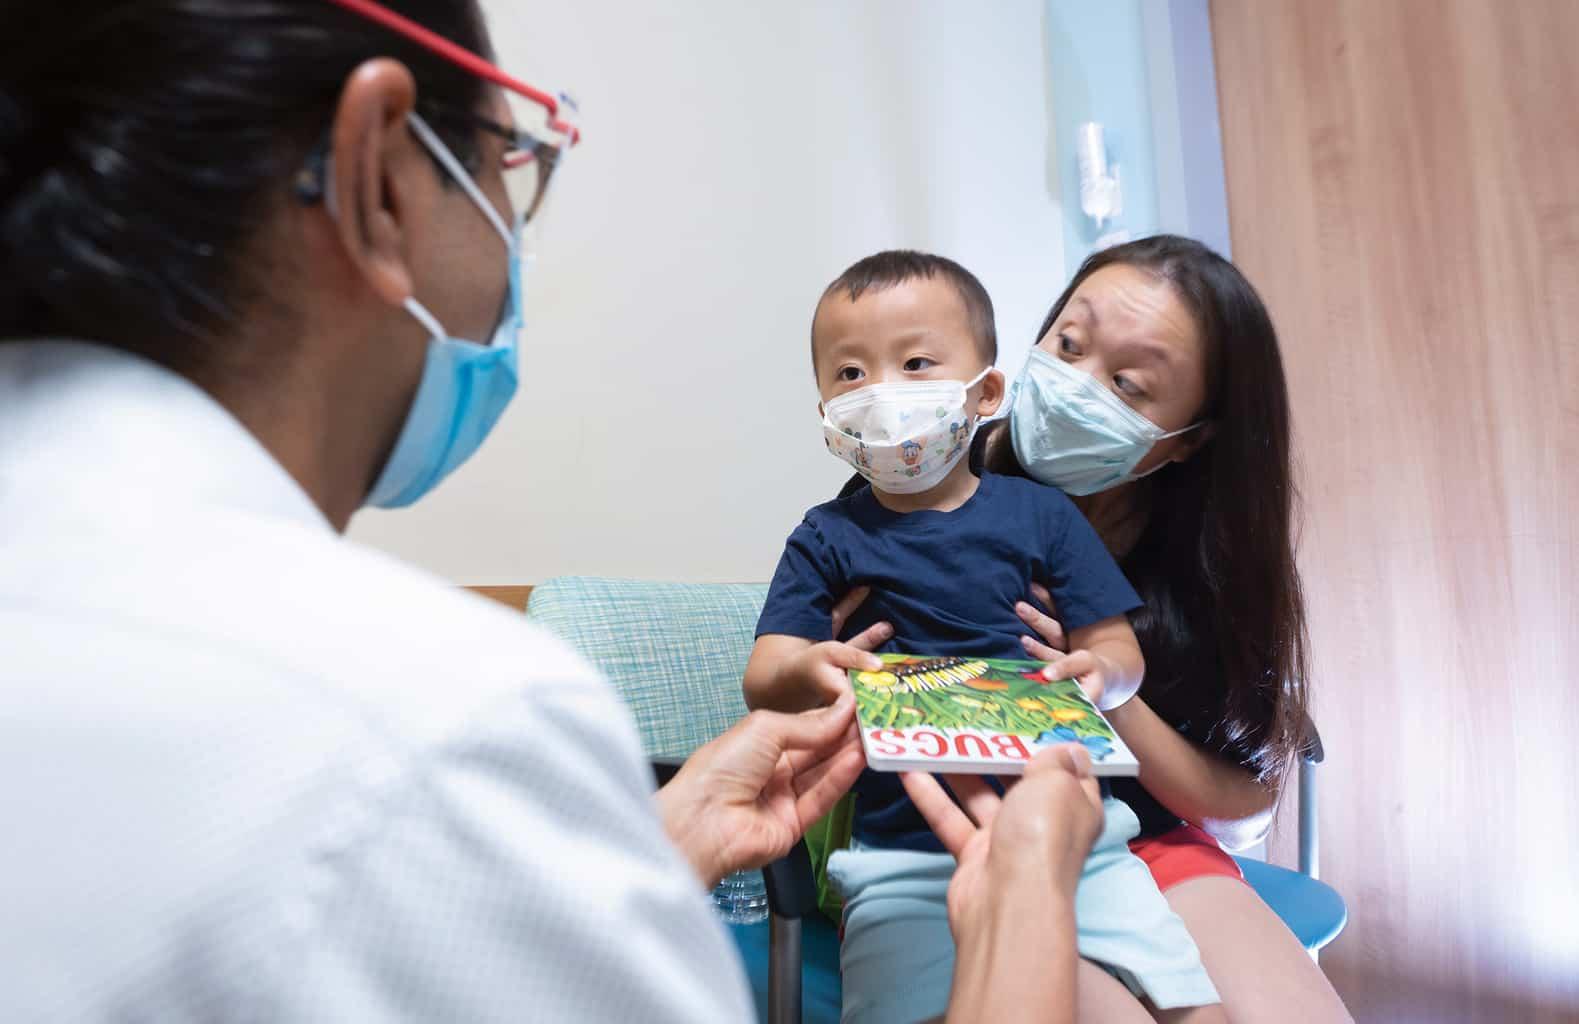 pediatrics mom child doctor in clinic